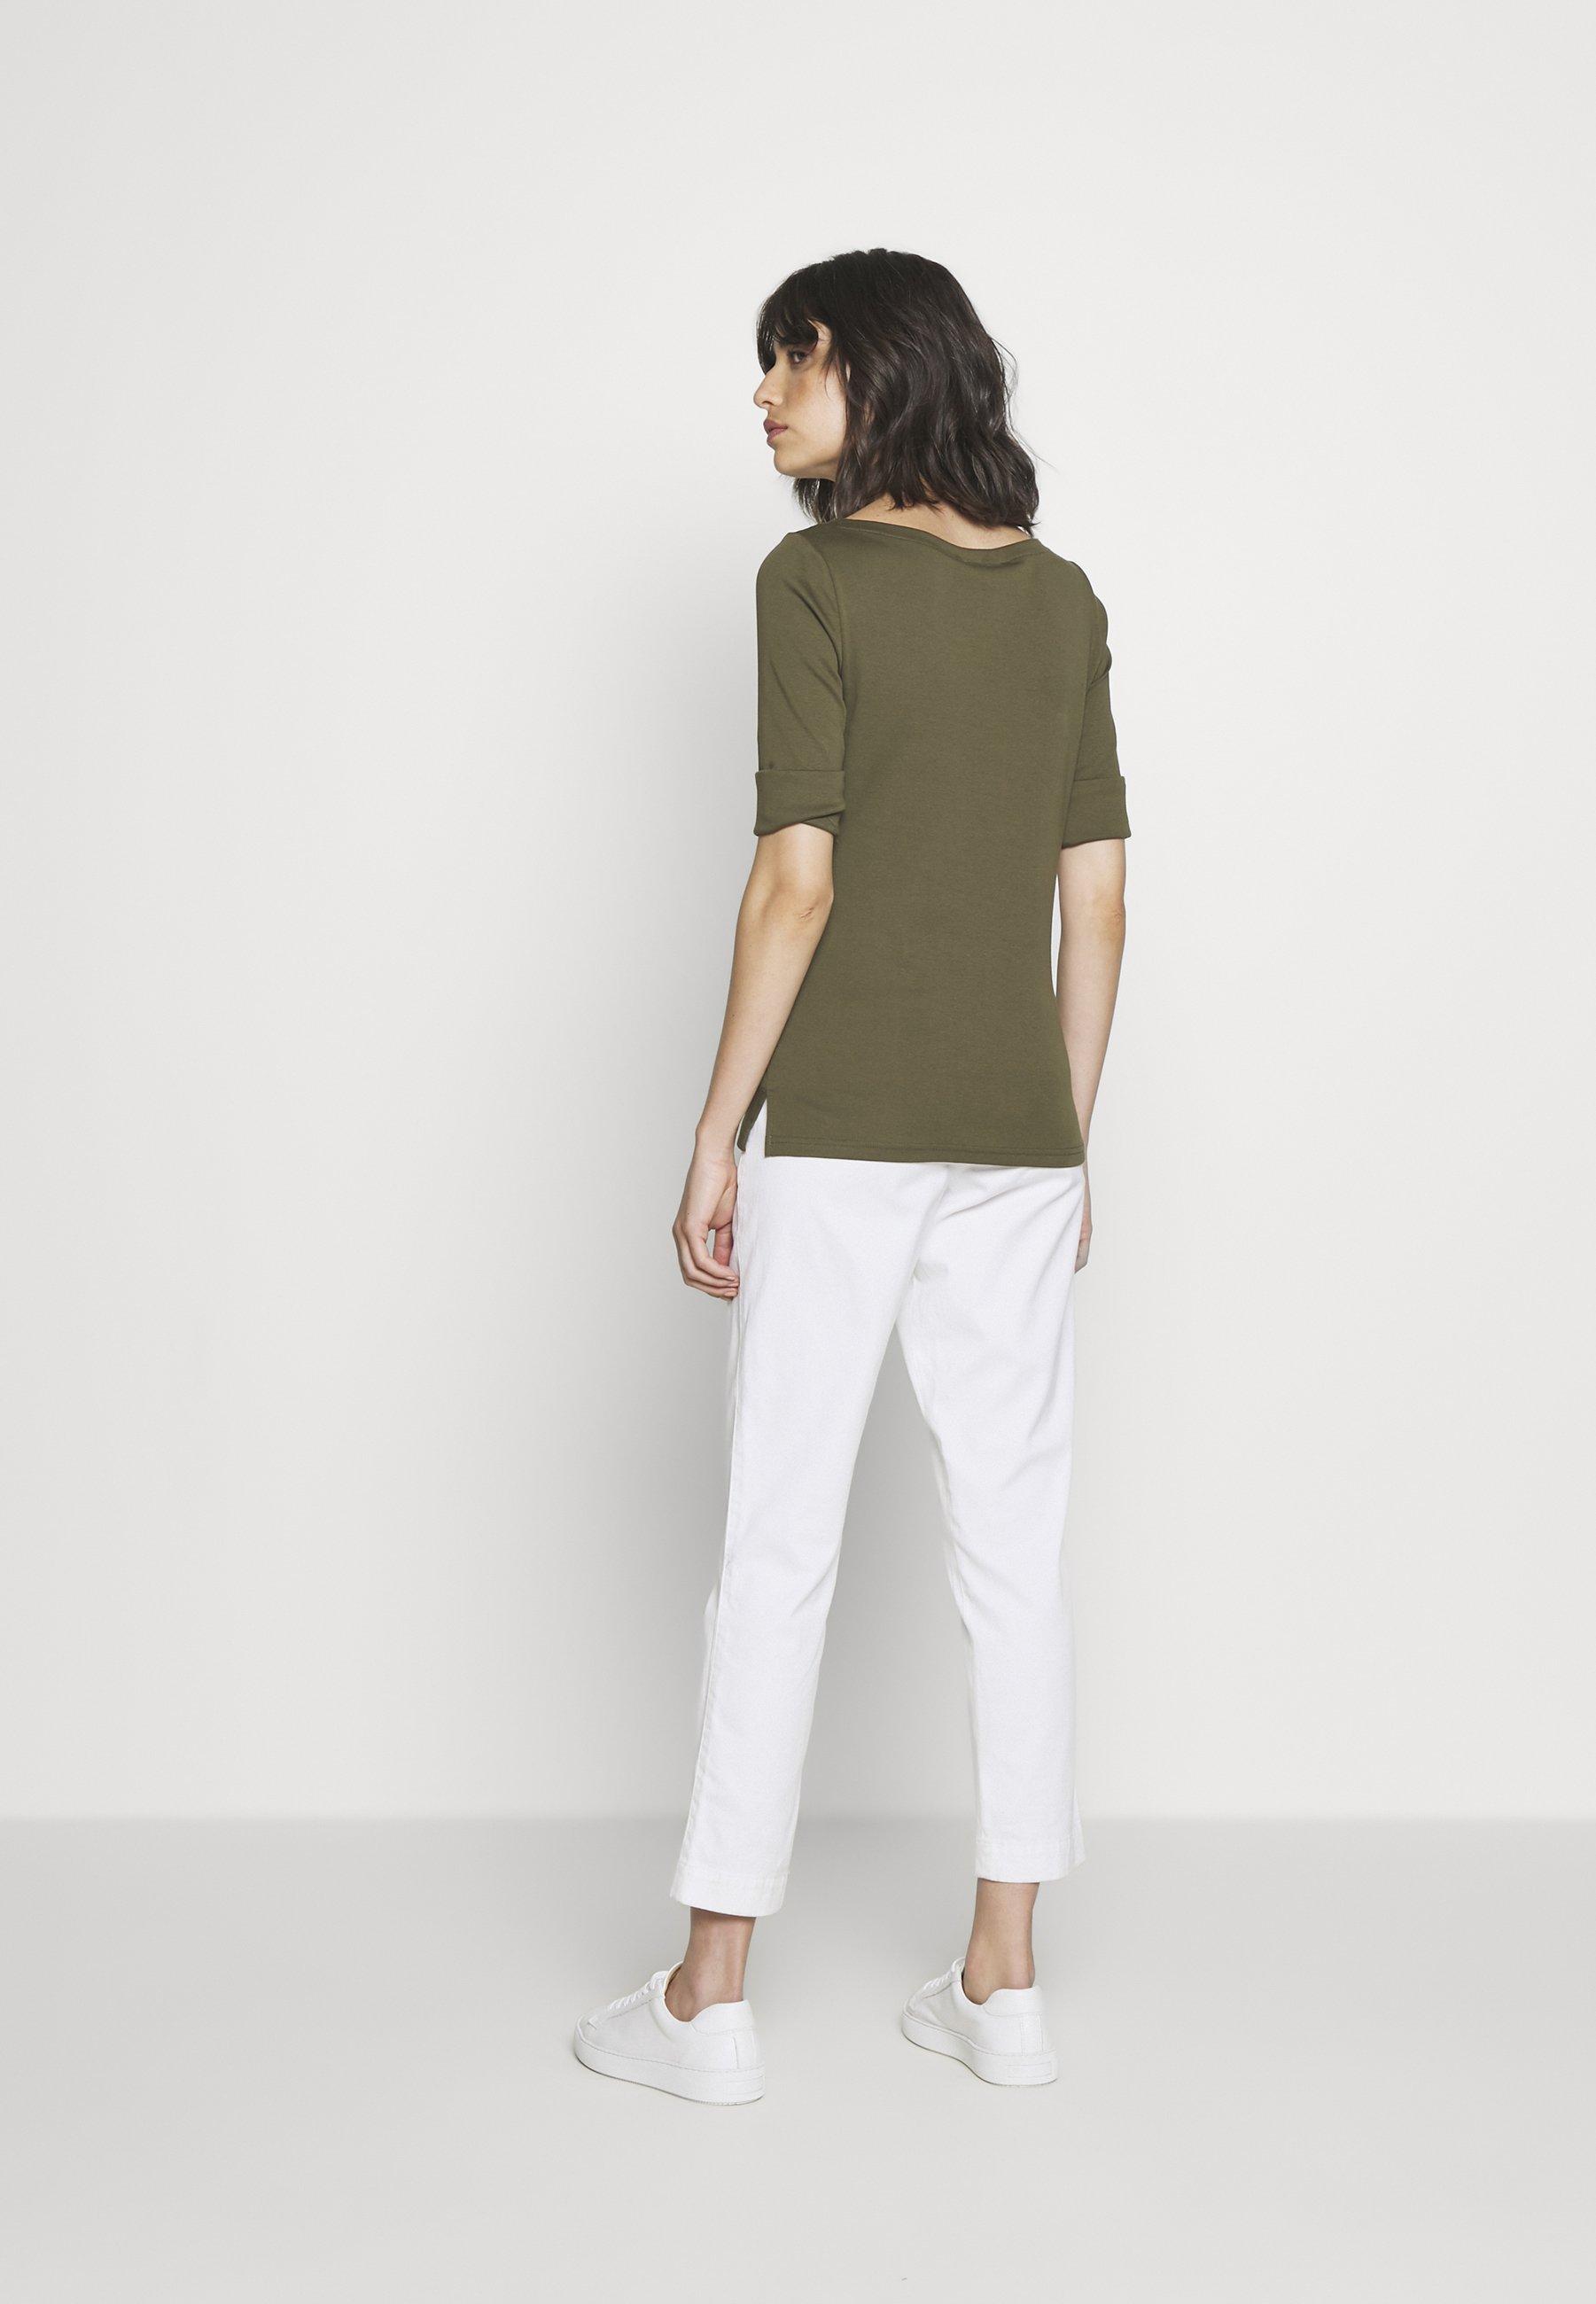 Lauren Ralph Lauren T-shirts - dark sage